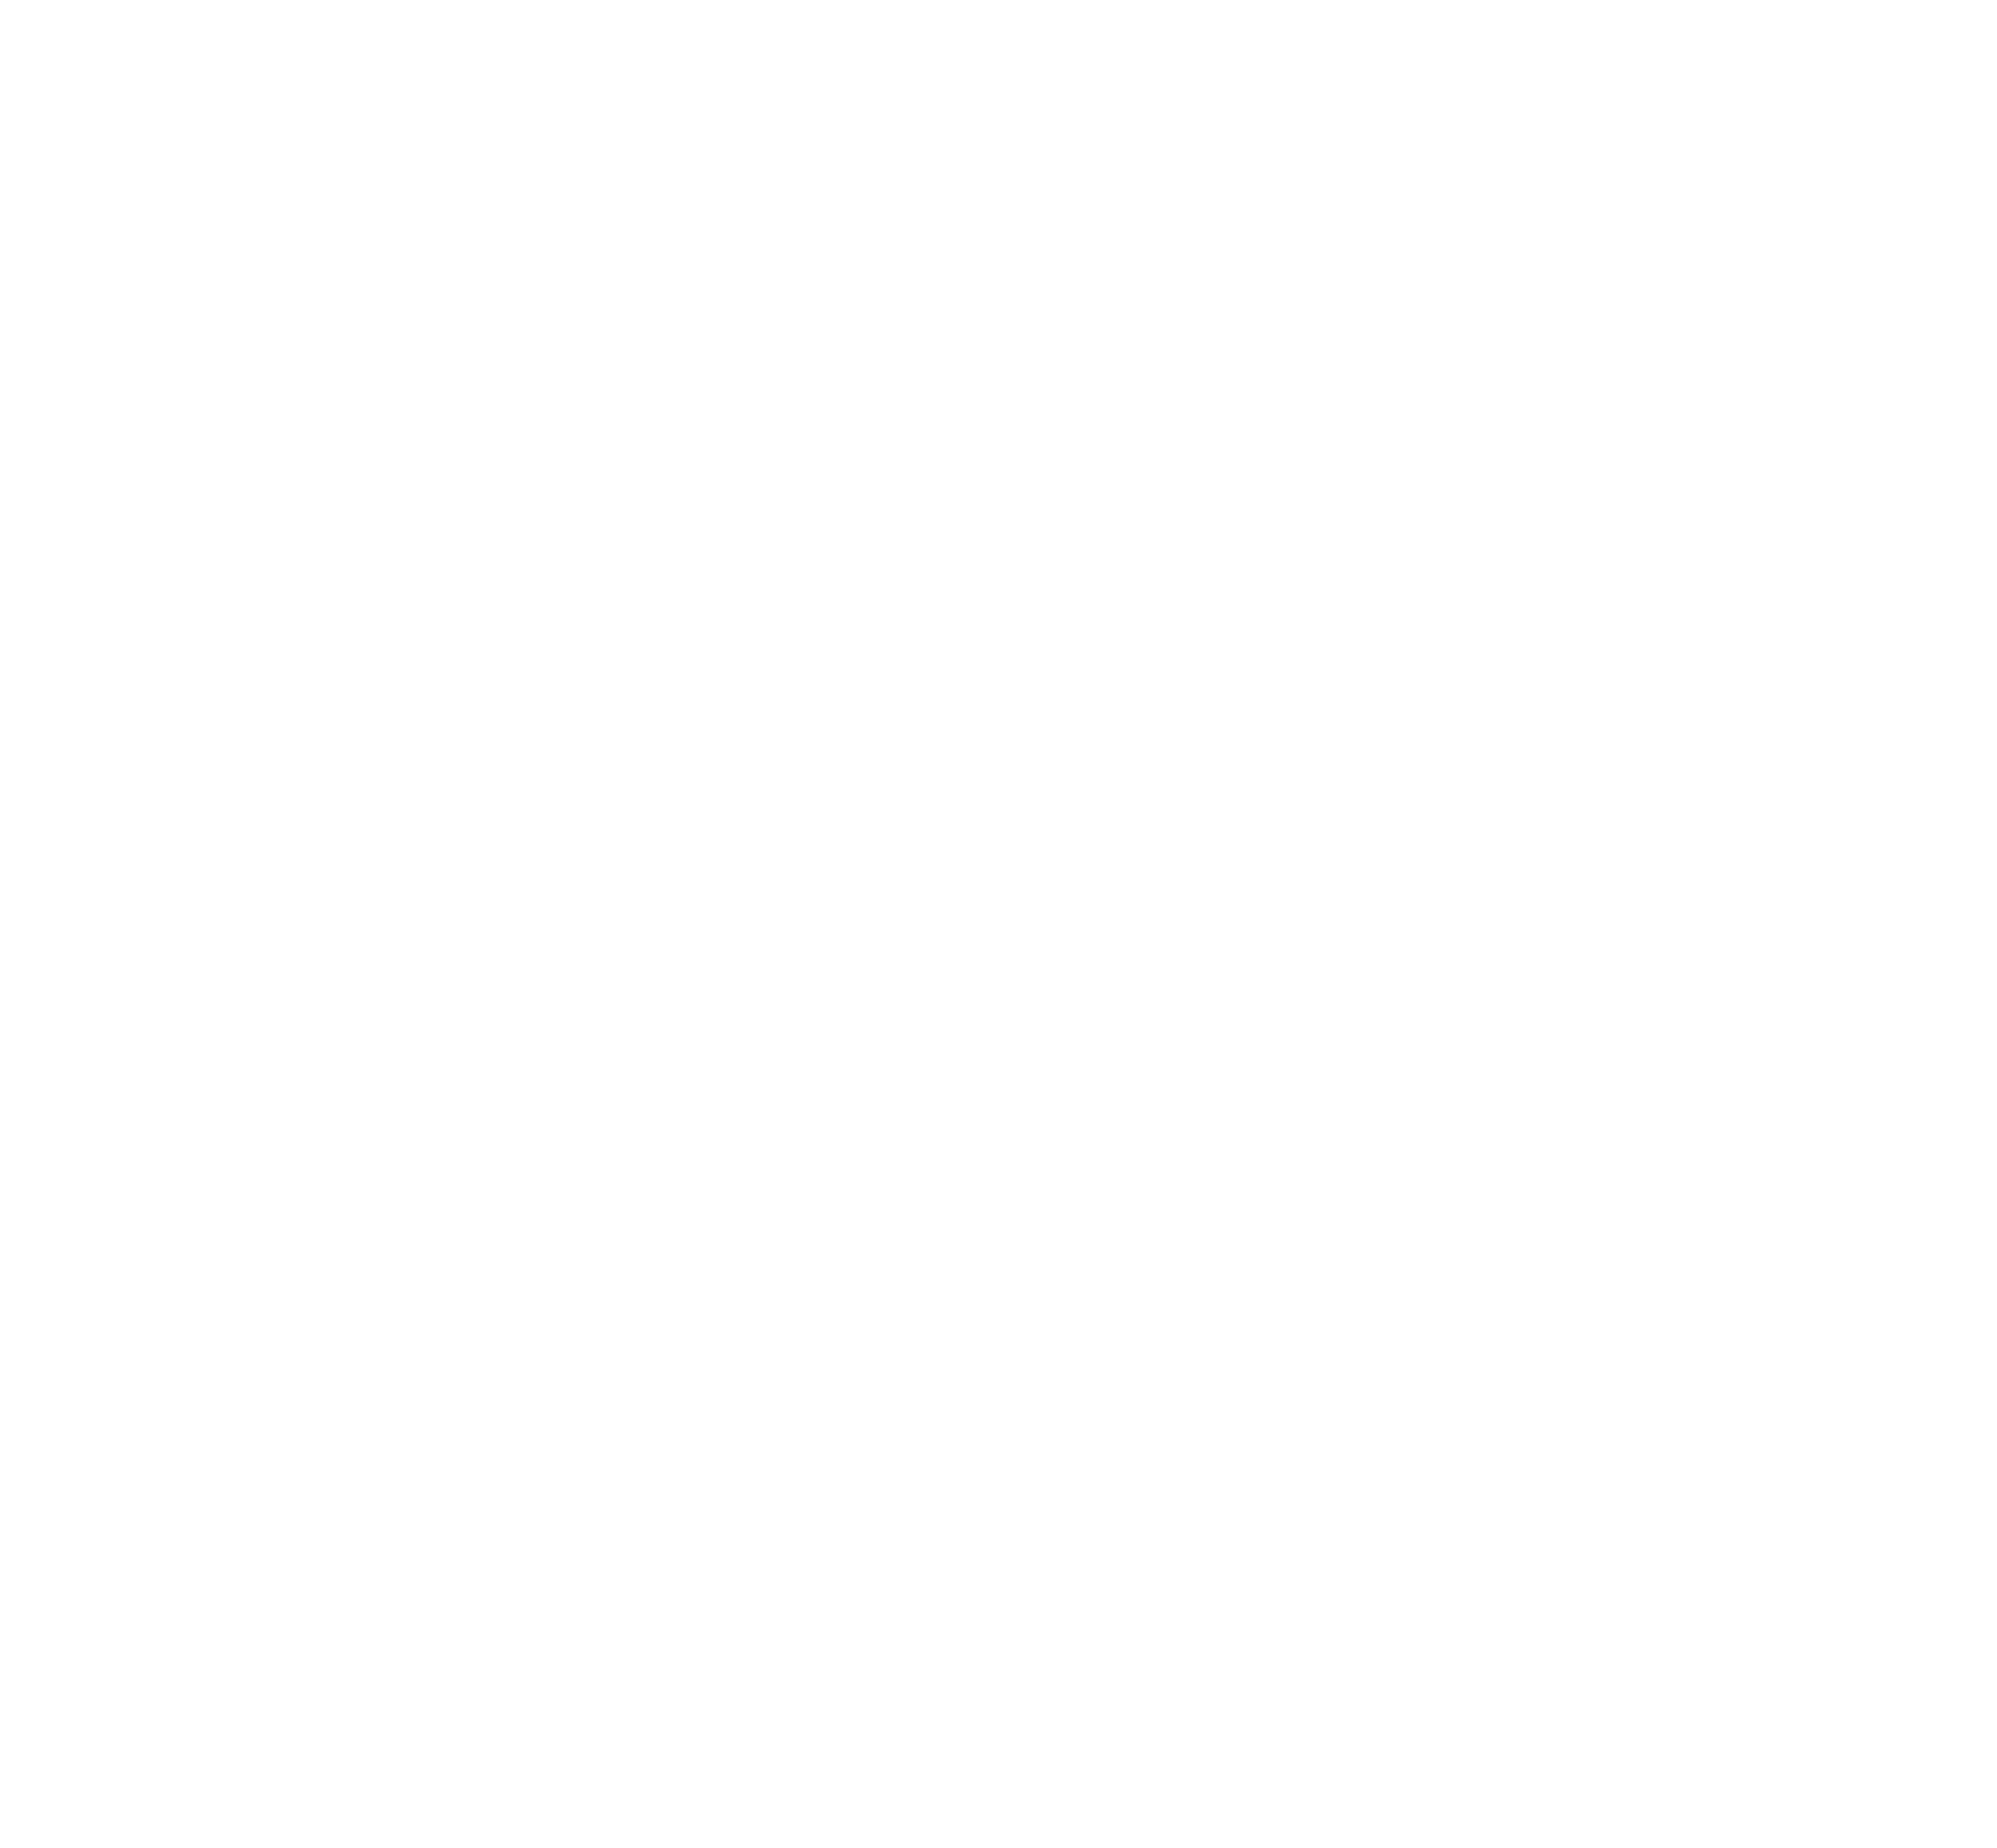 Coptrz Academy